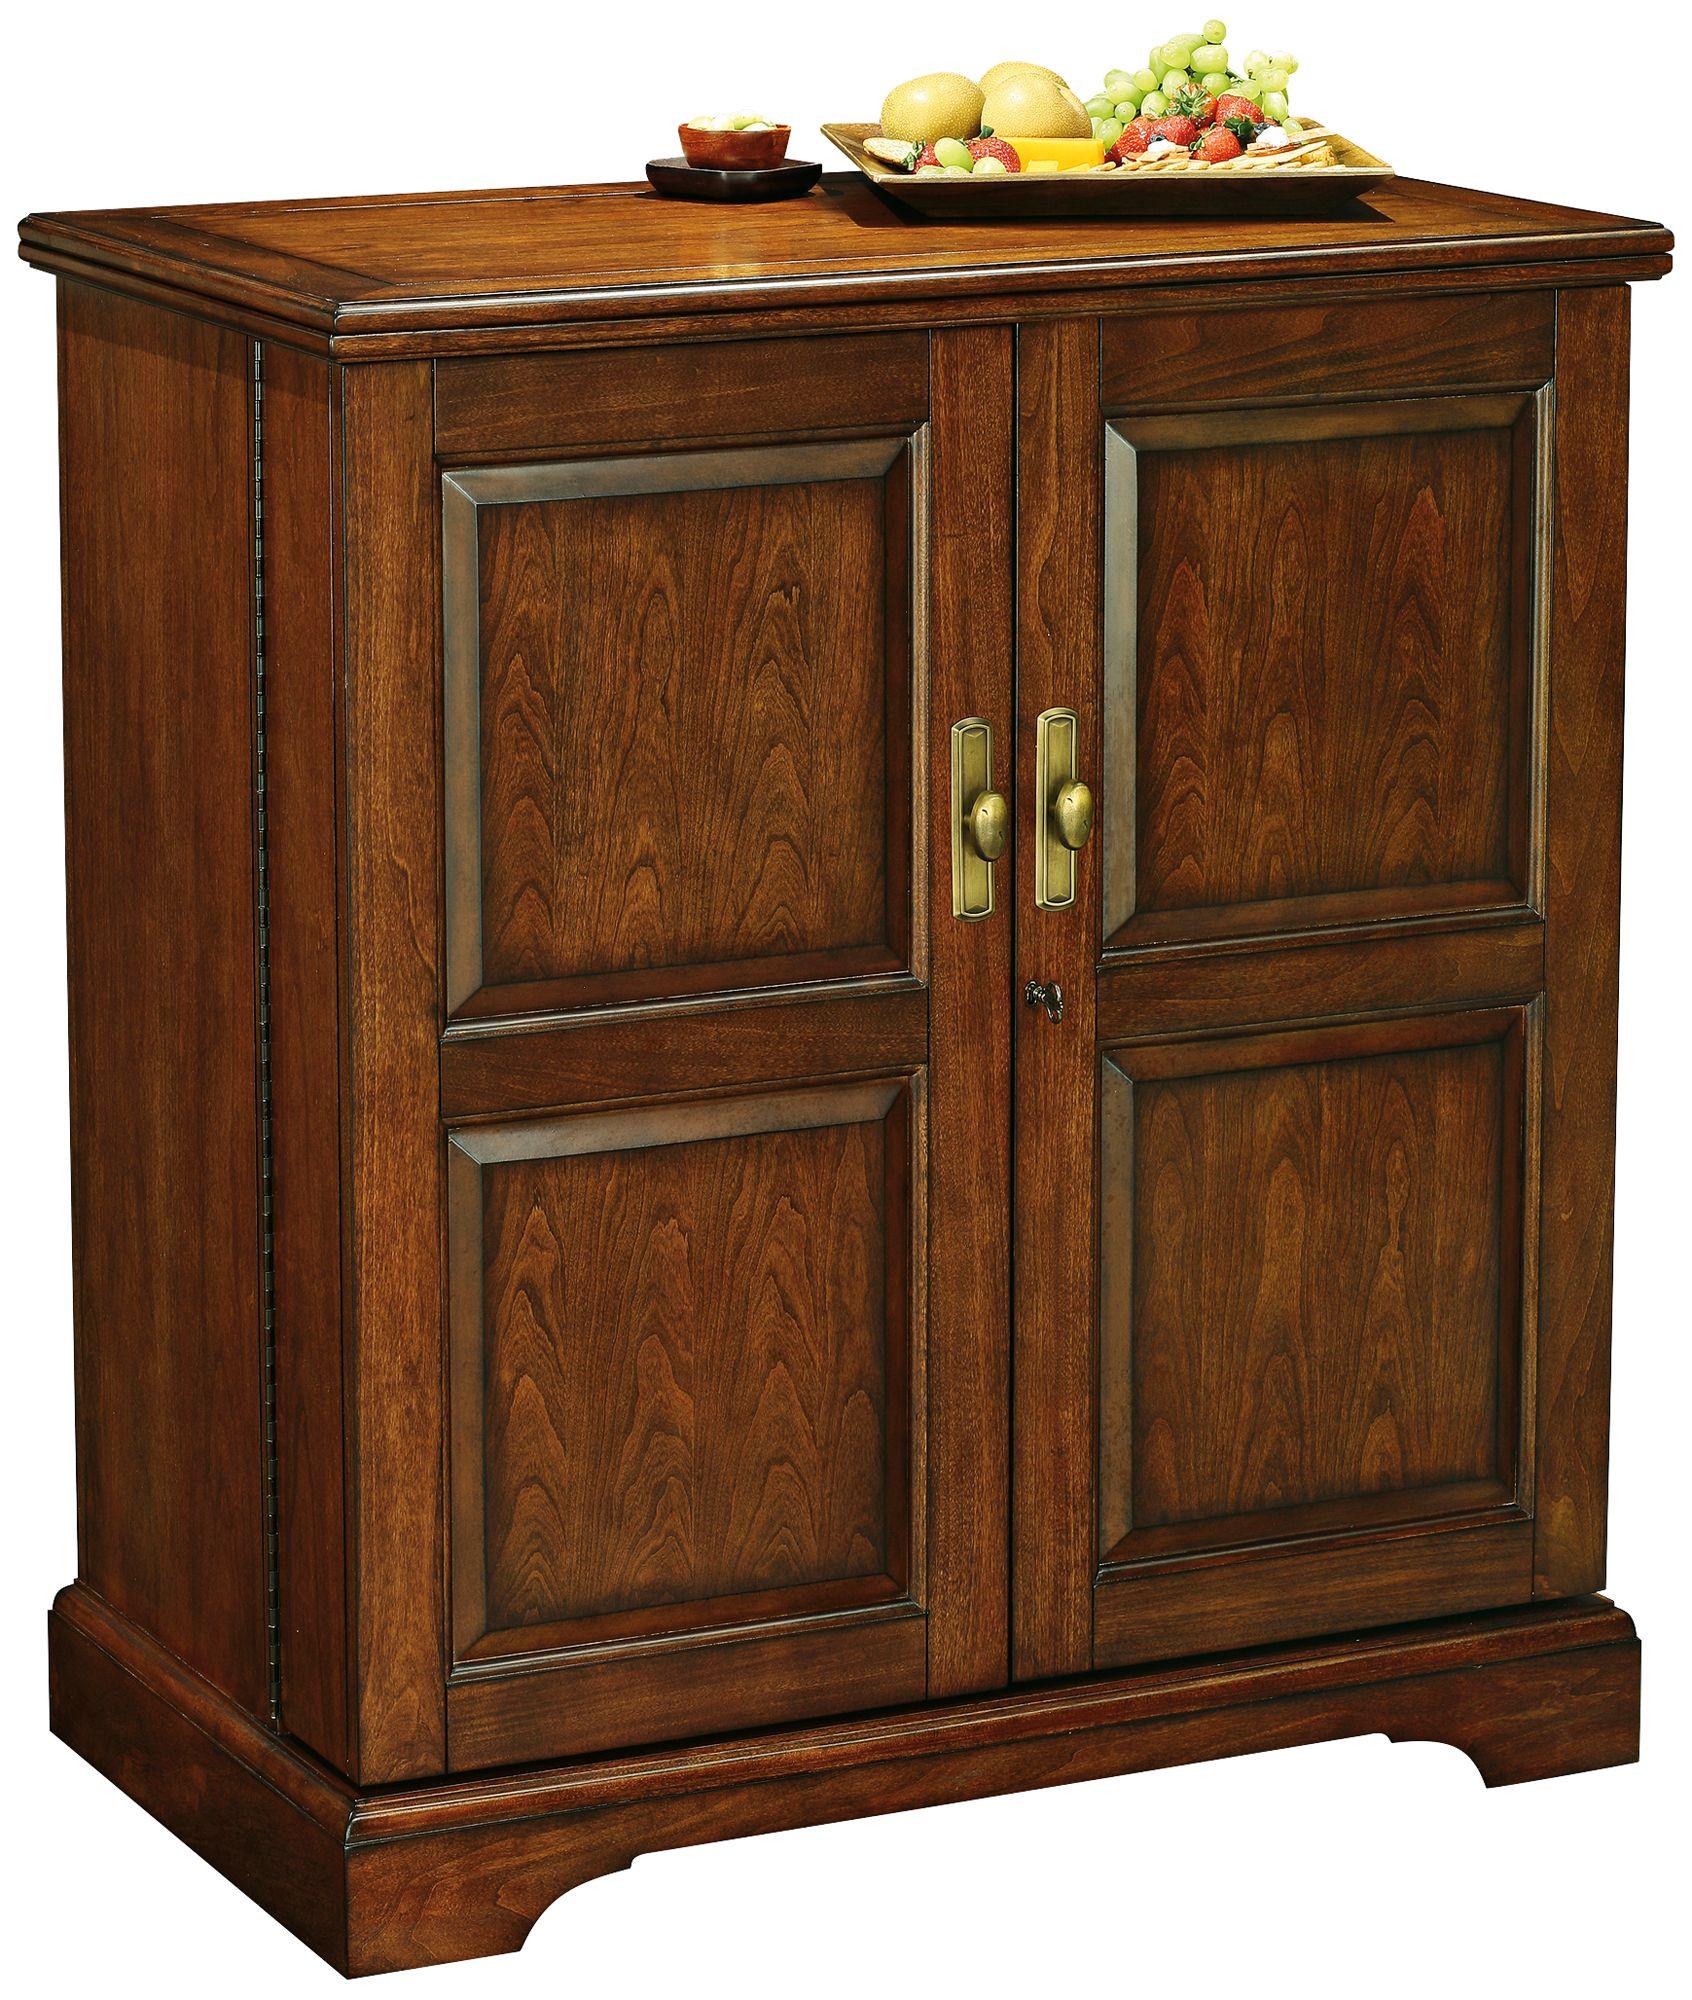 Superieur Lodi Americana Cherry 2 Door Wine And Bar Cabinet